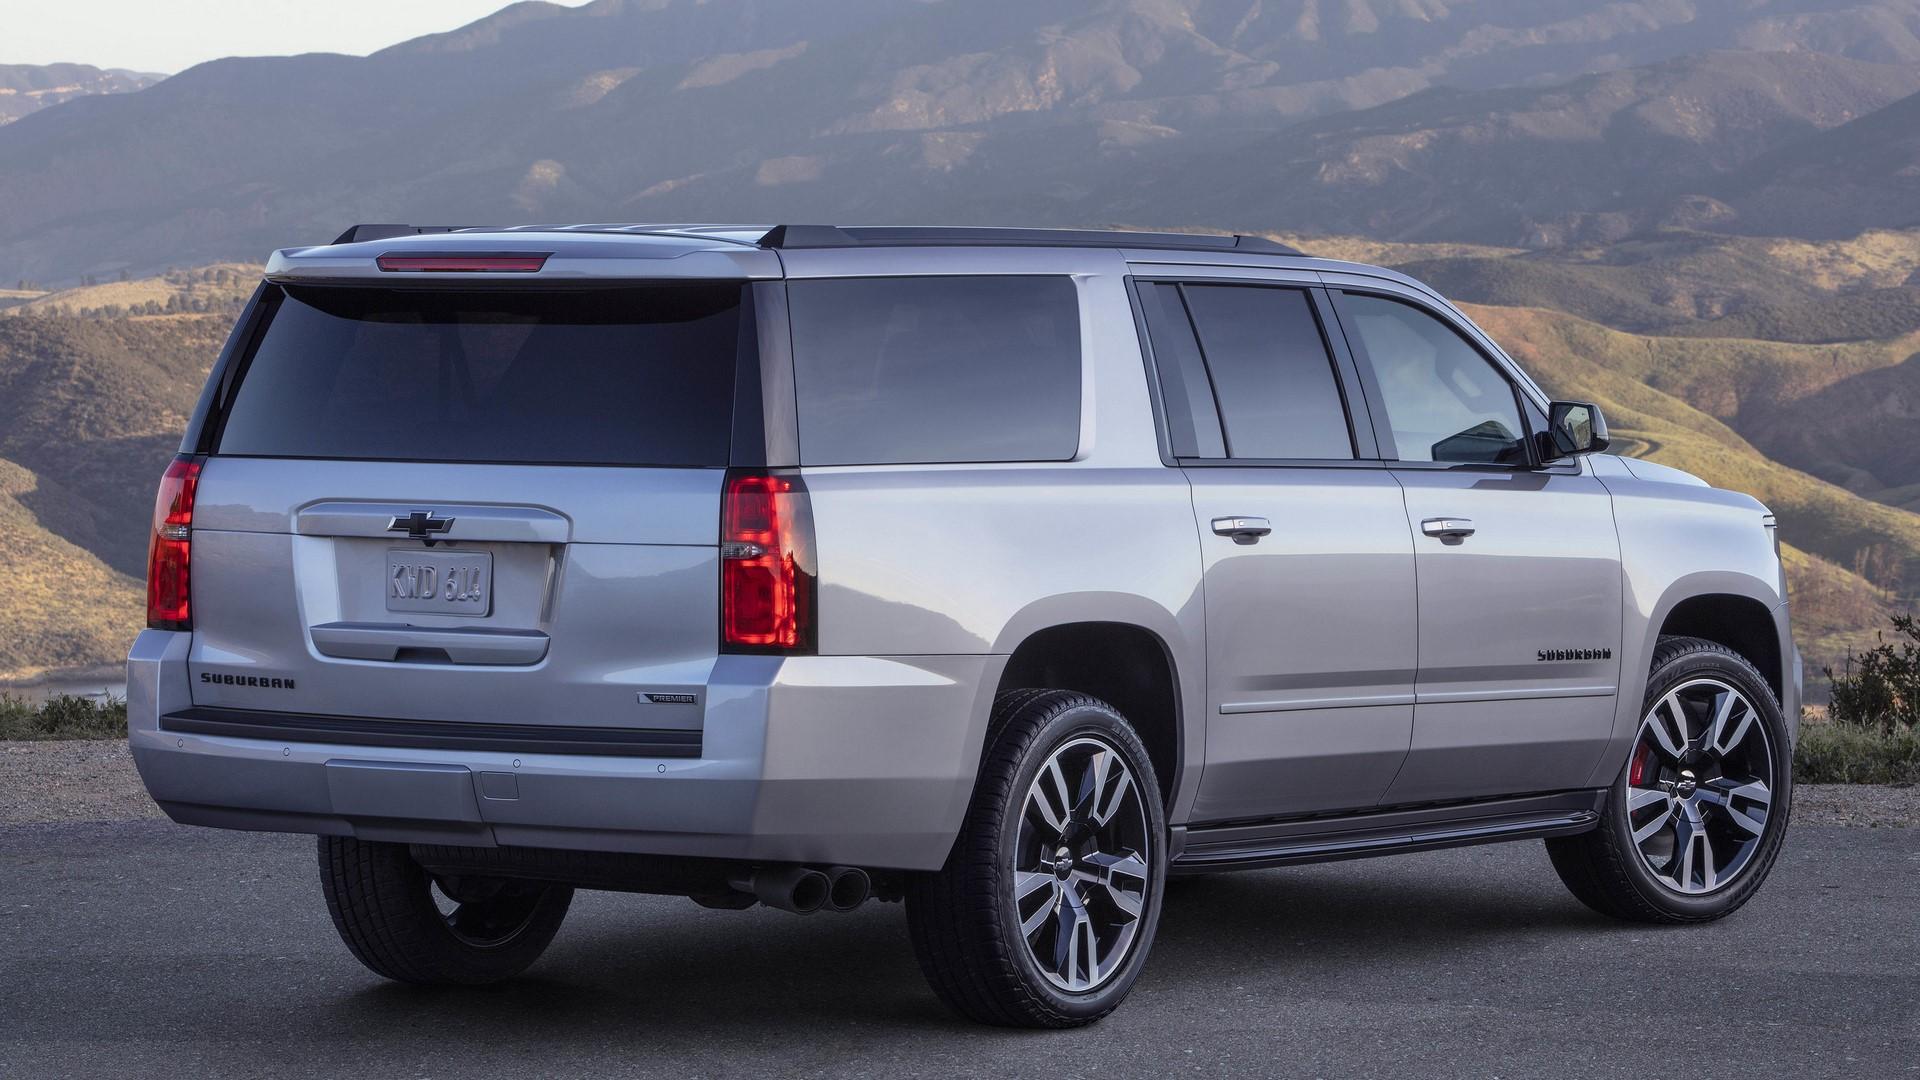 Chevrolet Suburban RST 2019 (2)